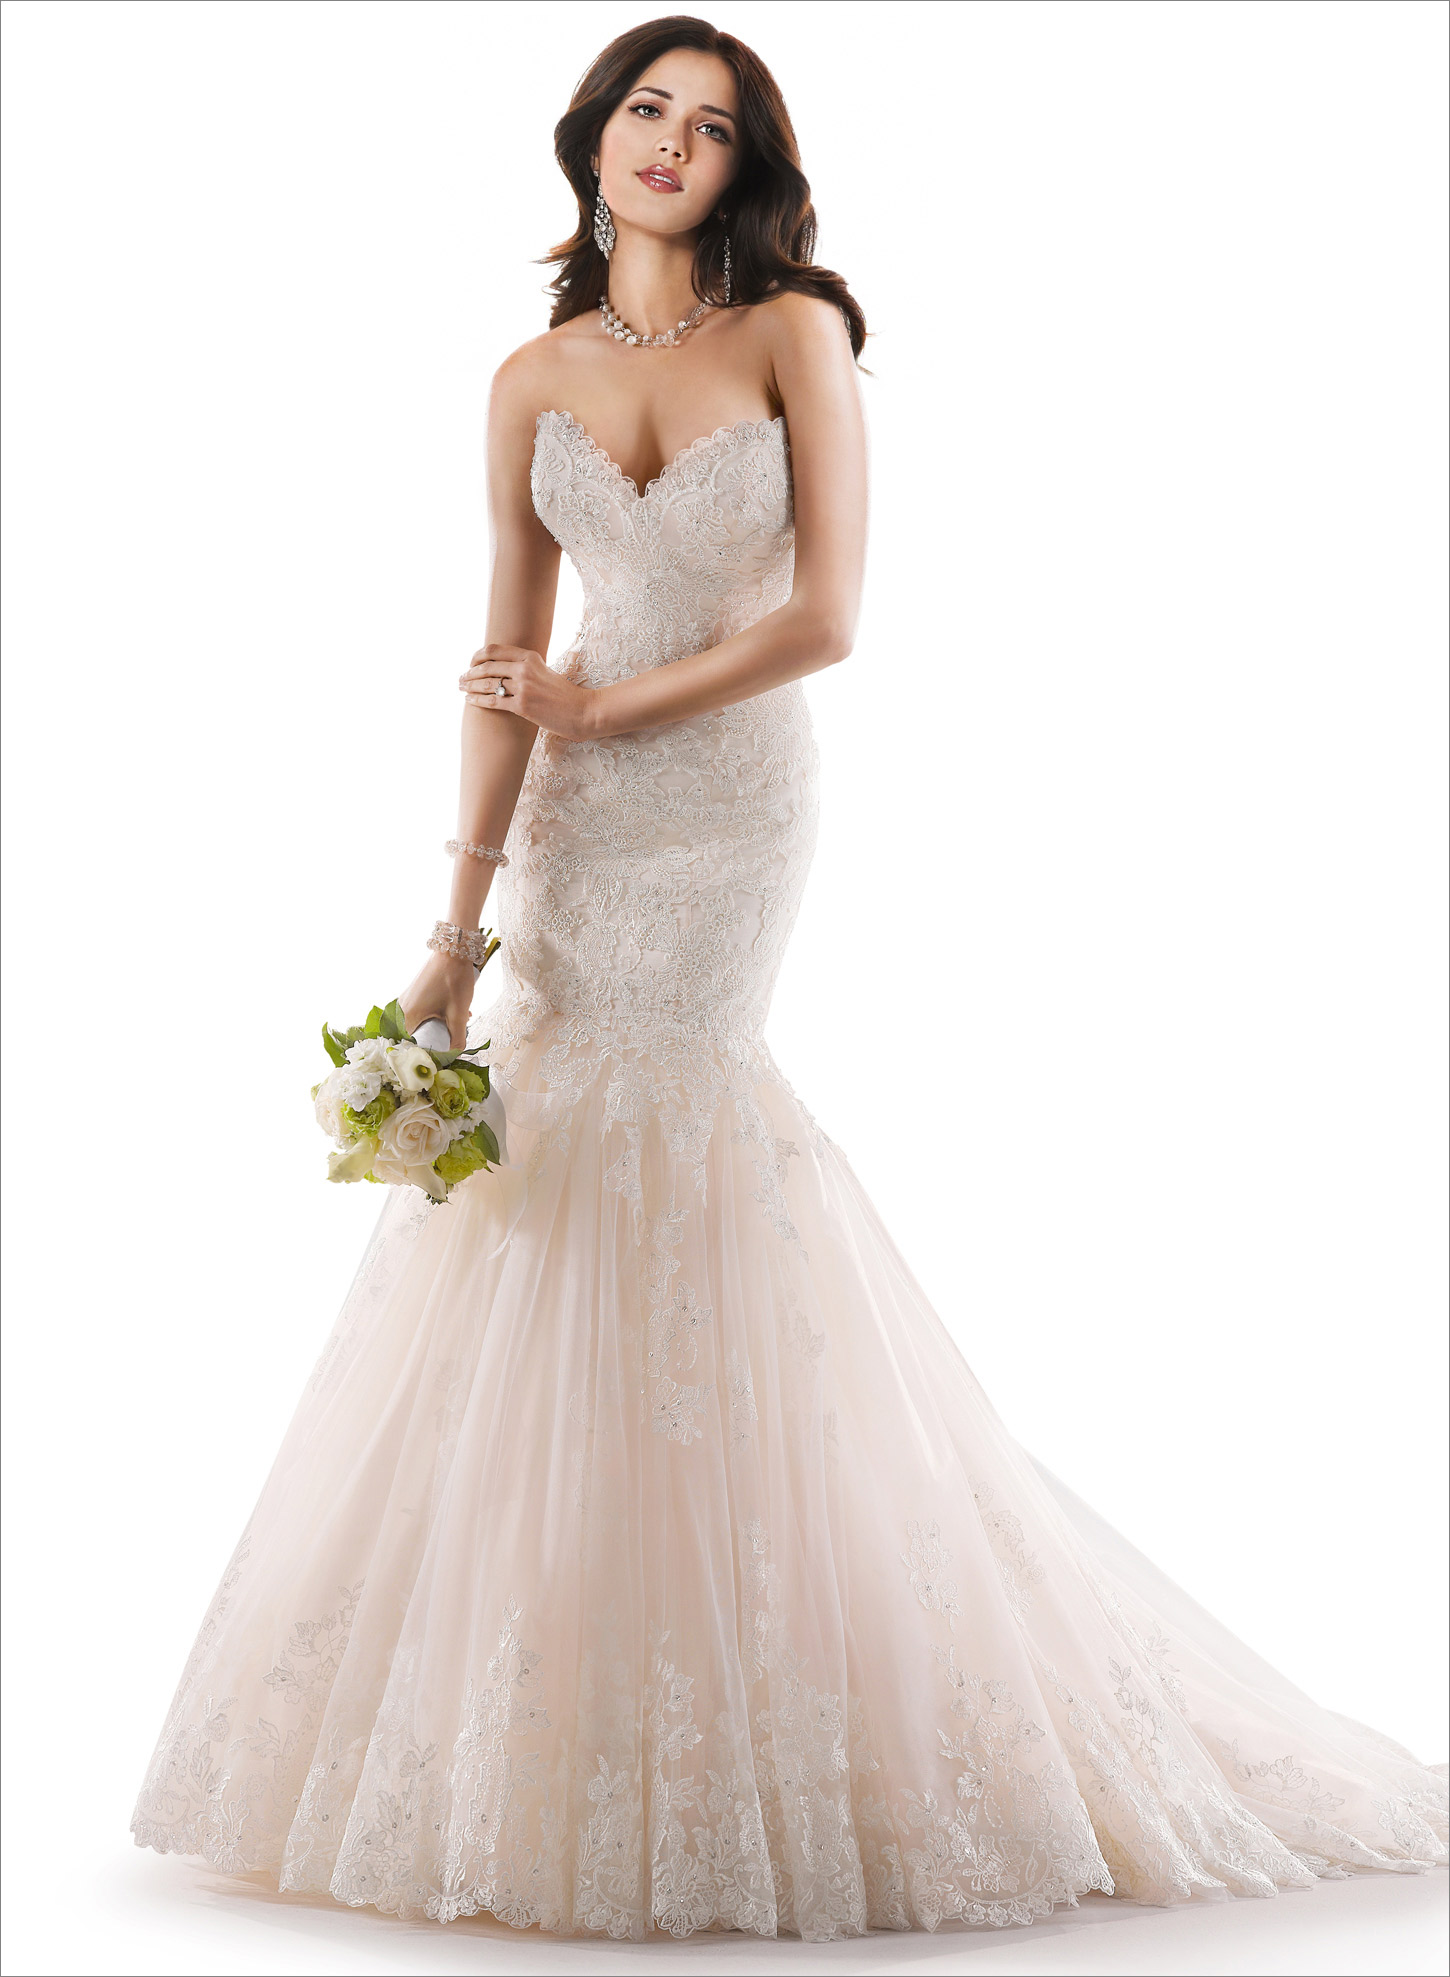 blush colored wedding dress blush colored wedding dress Blush colored wedding dress